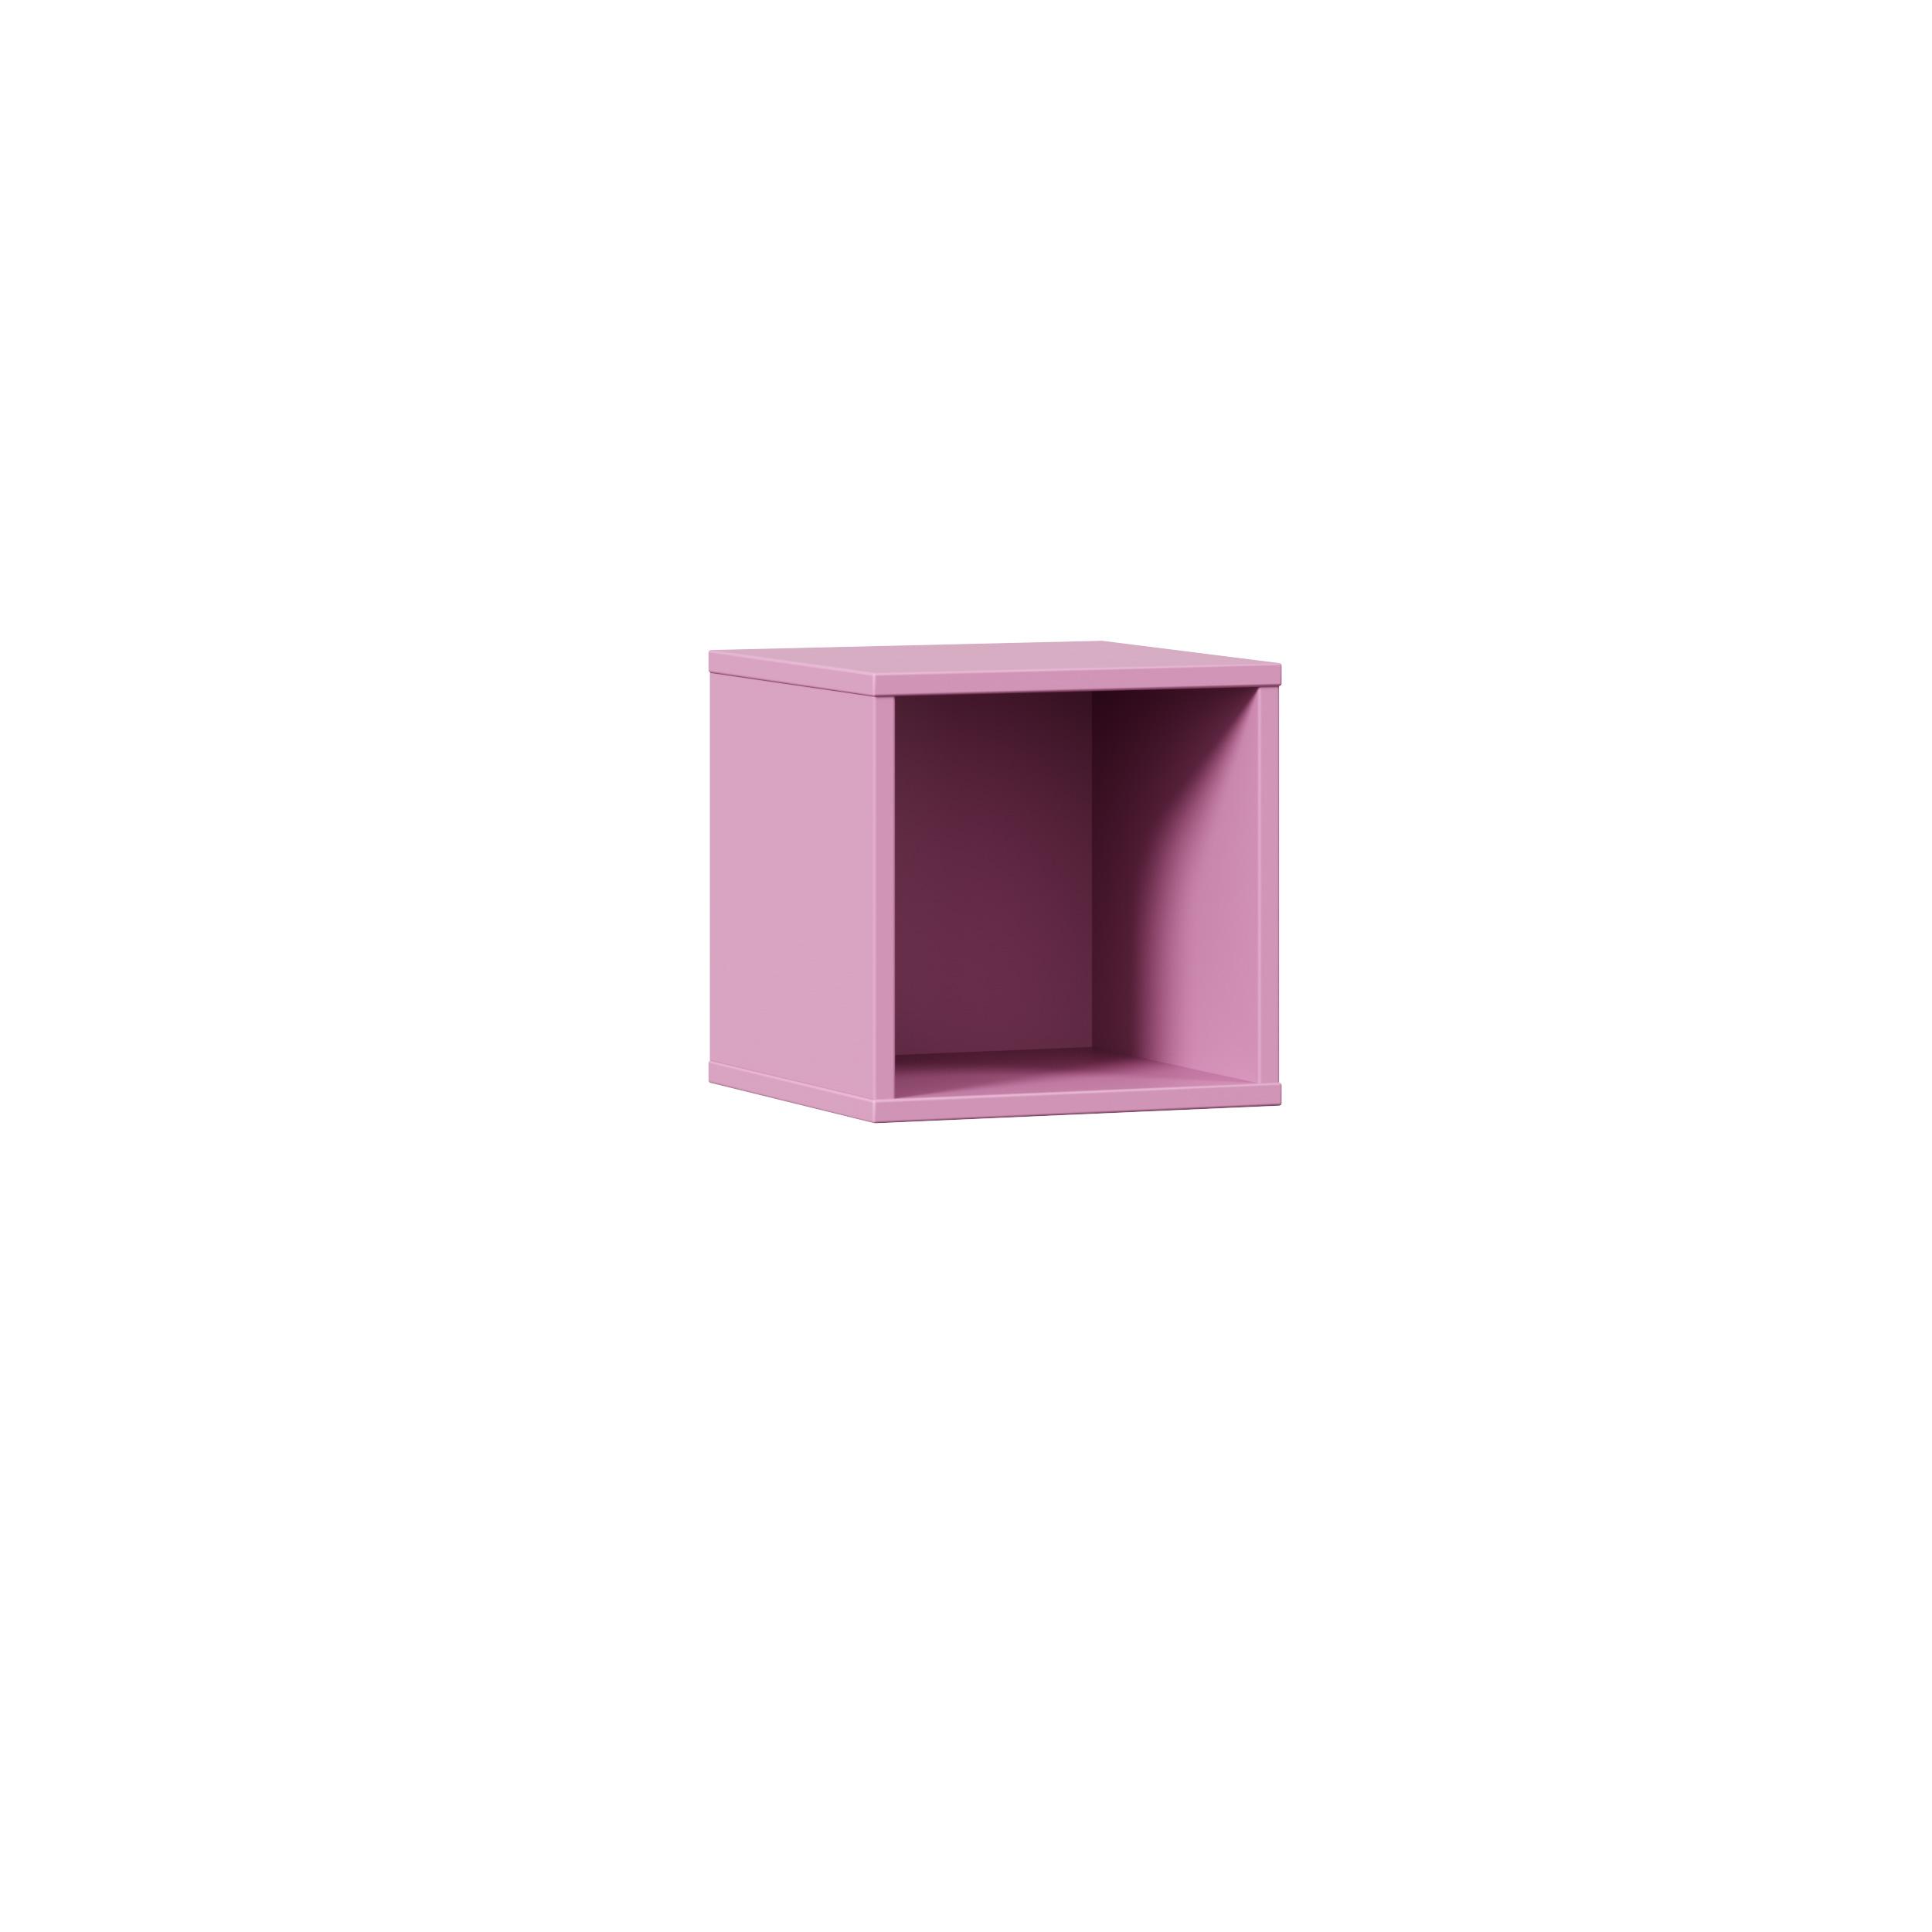 Lubidom quadratisches Wandregal Urban in Pink